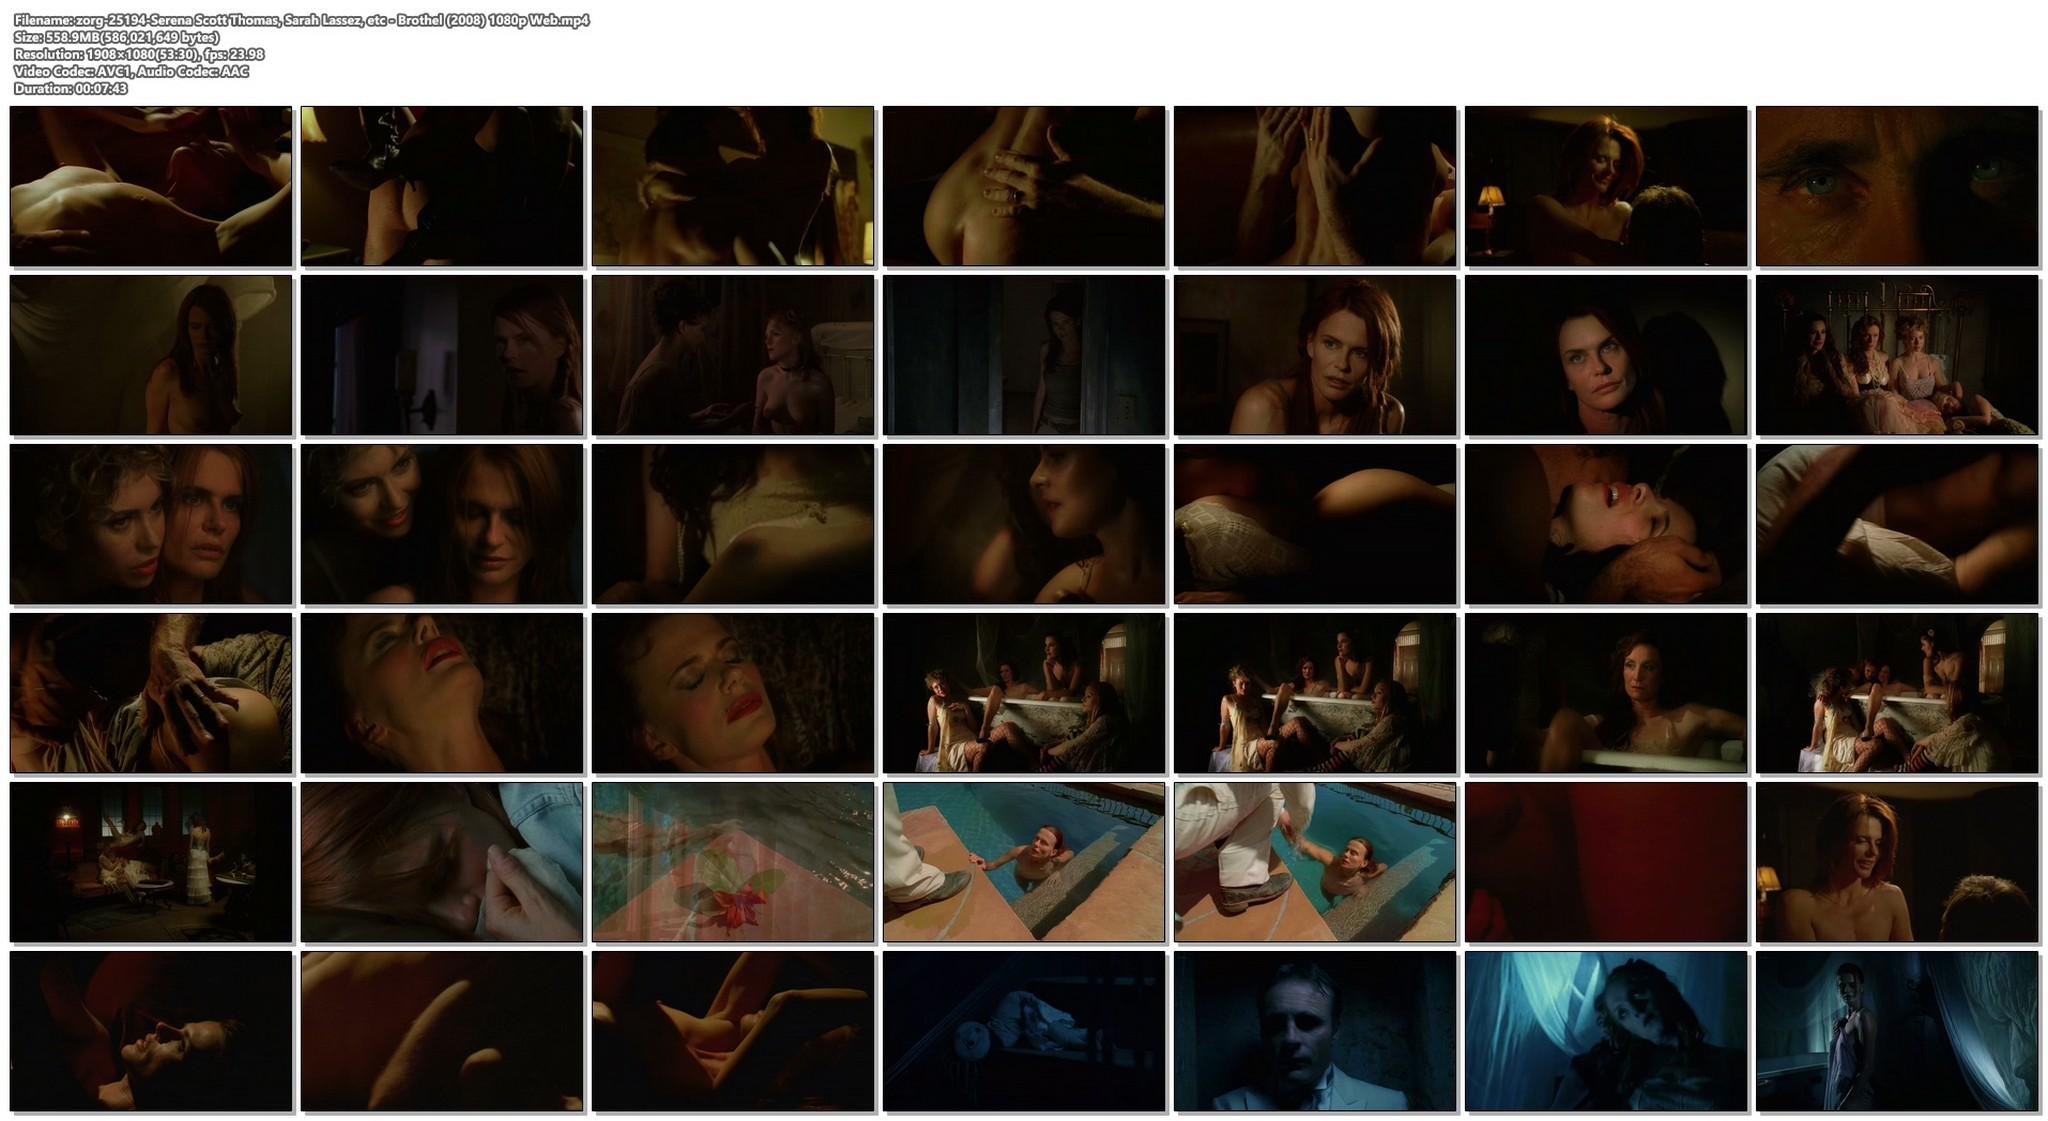 Serena Scott Thomas nude sex Sarah Lassez and others nude too Brothel 2008 1080p Web 20